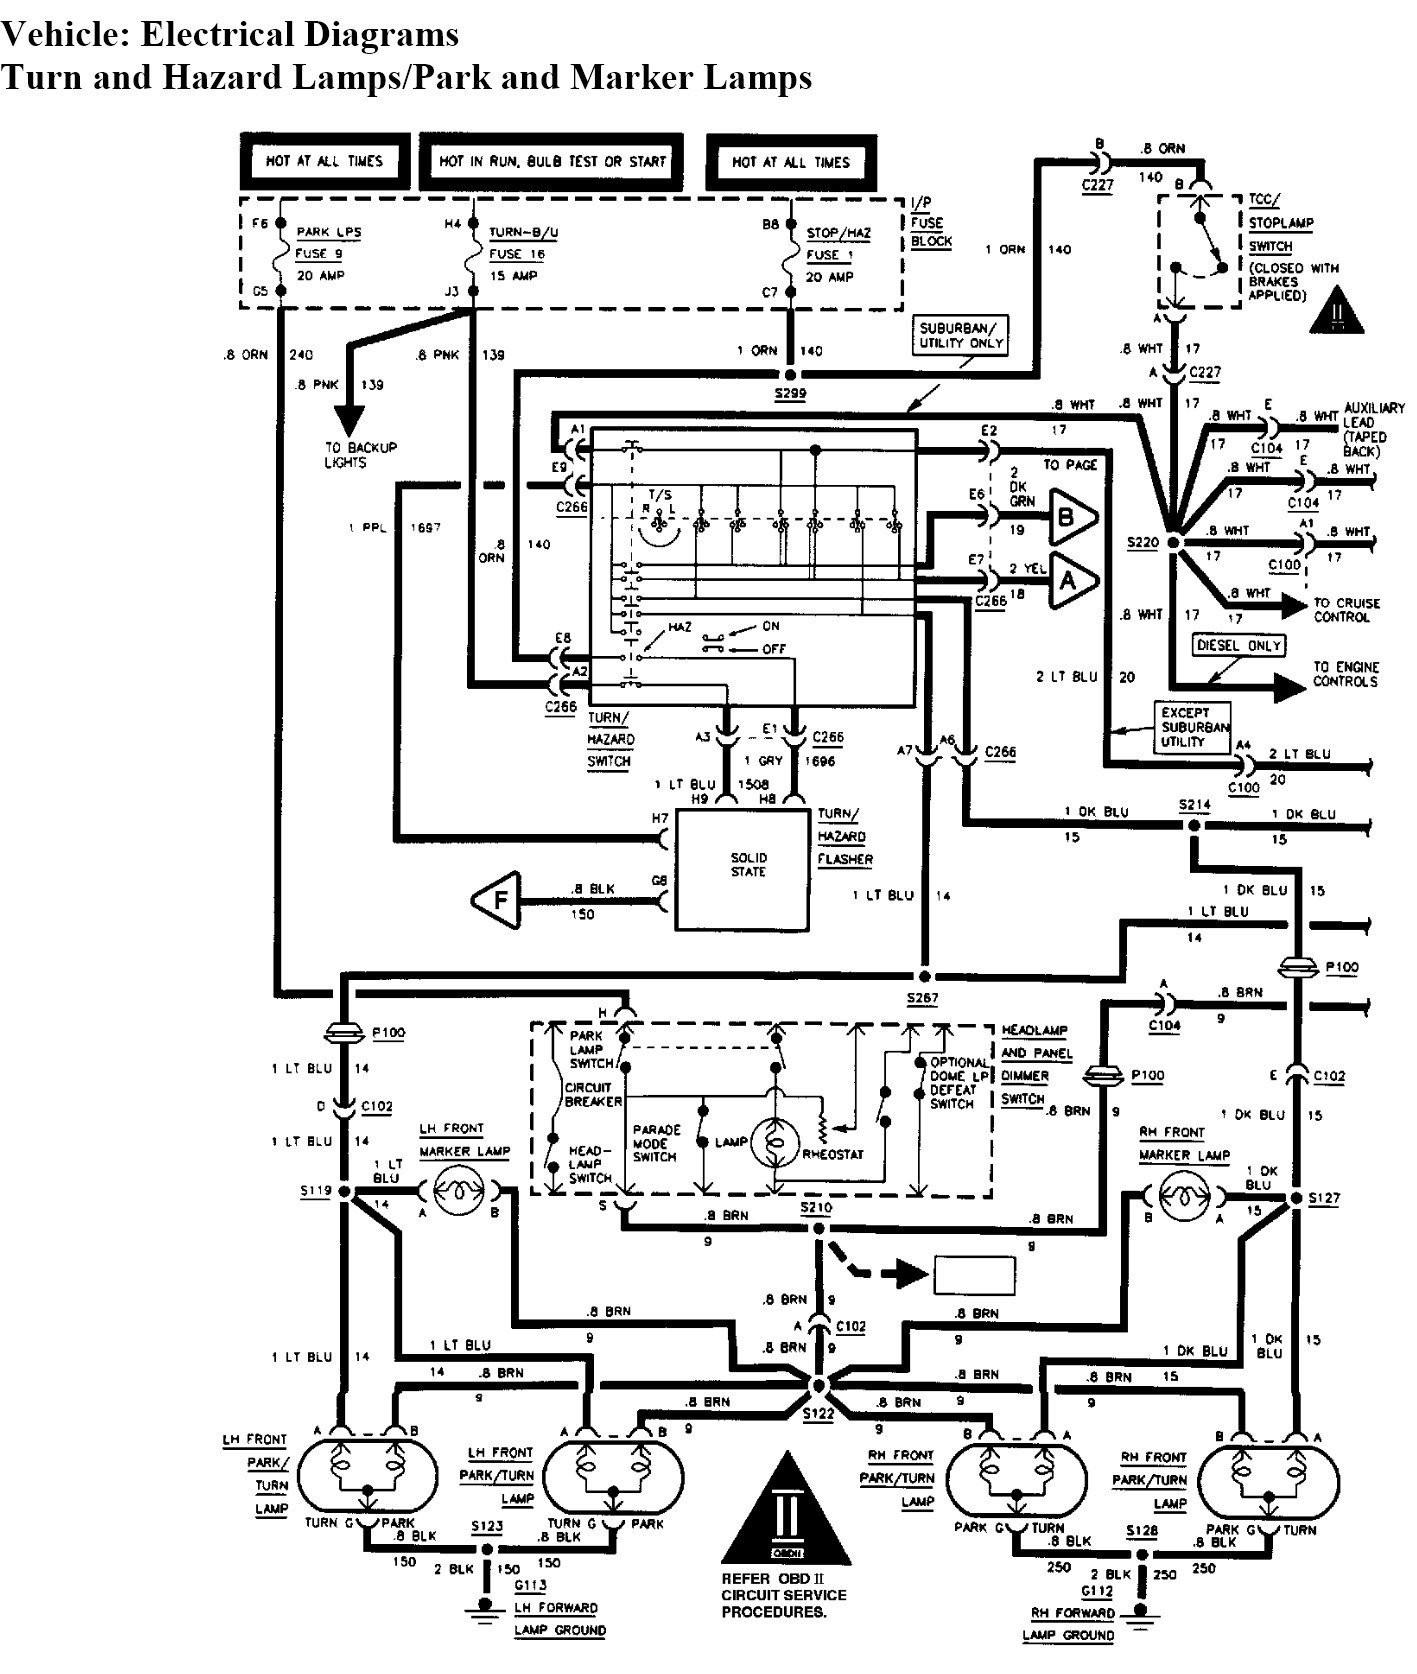 2005 Chevy Trailblazer Engine Diagram Chevy Trailblazer Tail Light Diagram Wiring Diagram Rows Of 2005 Chevy Trailblazer Engine Diagram